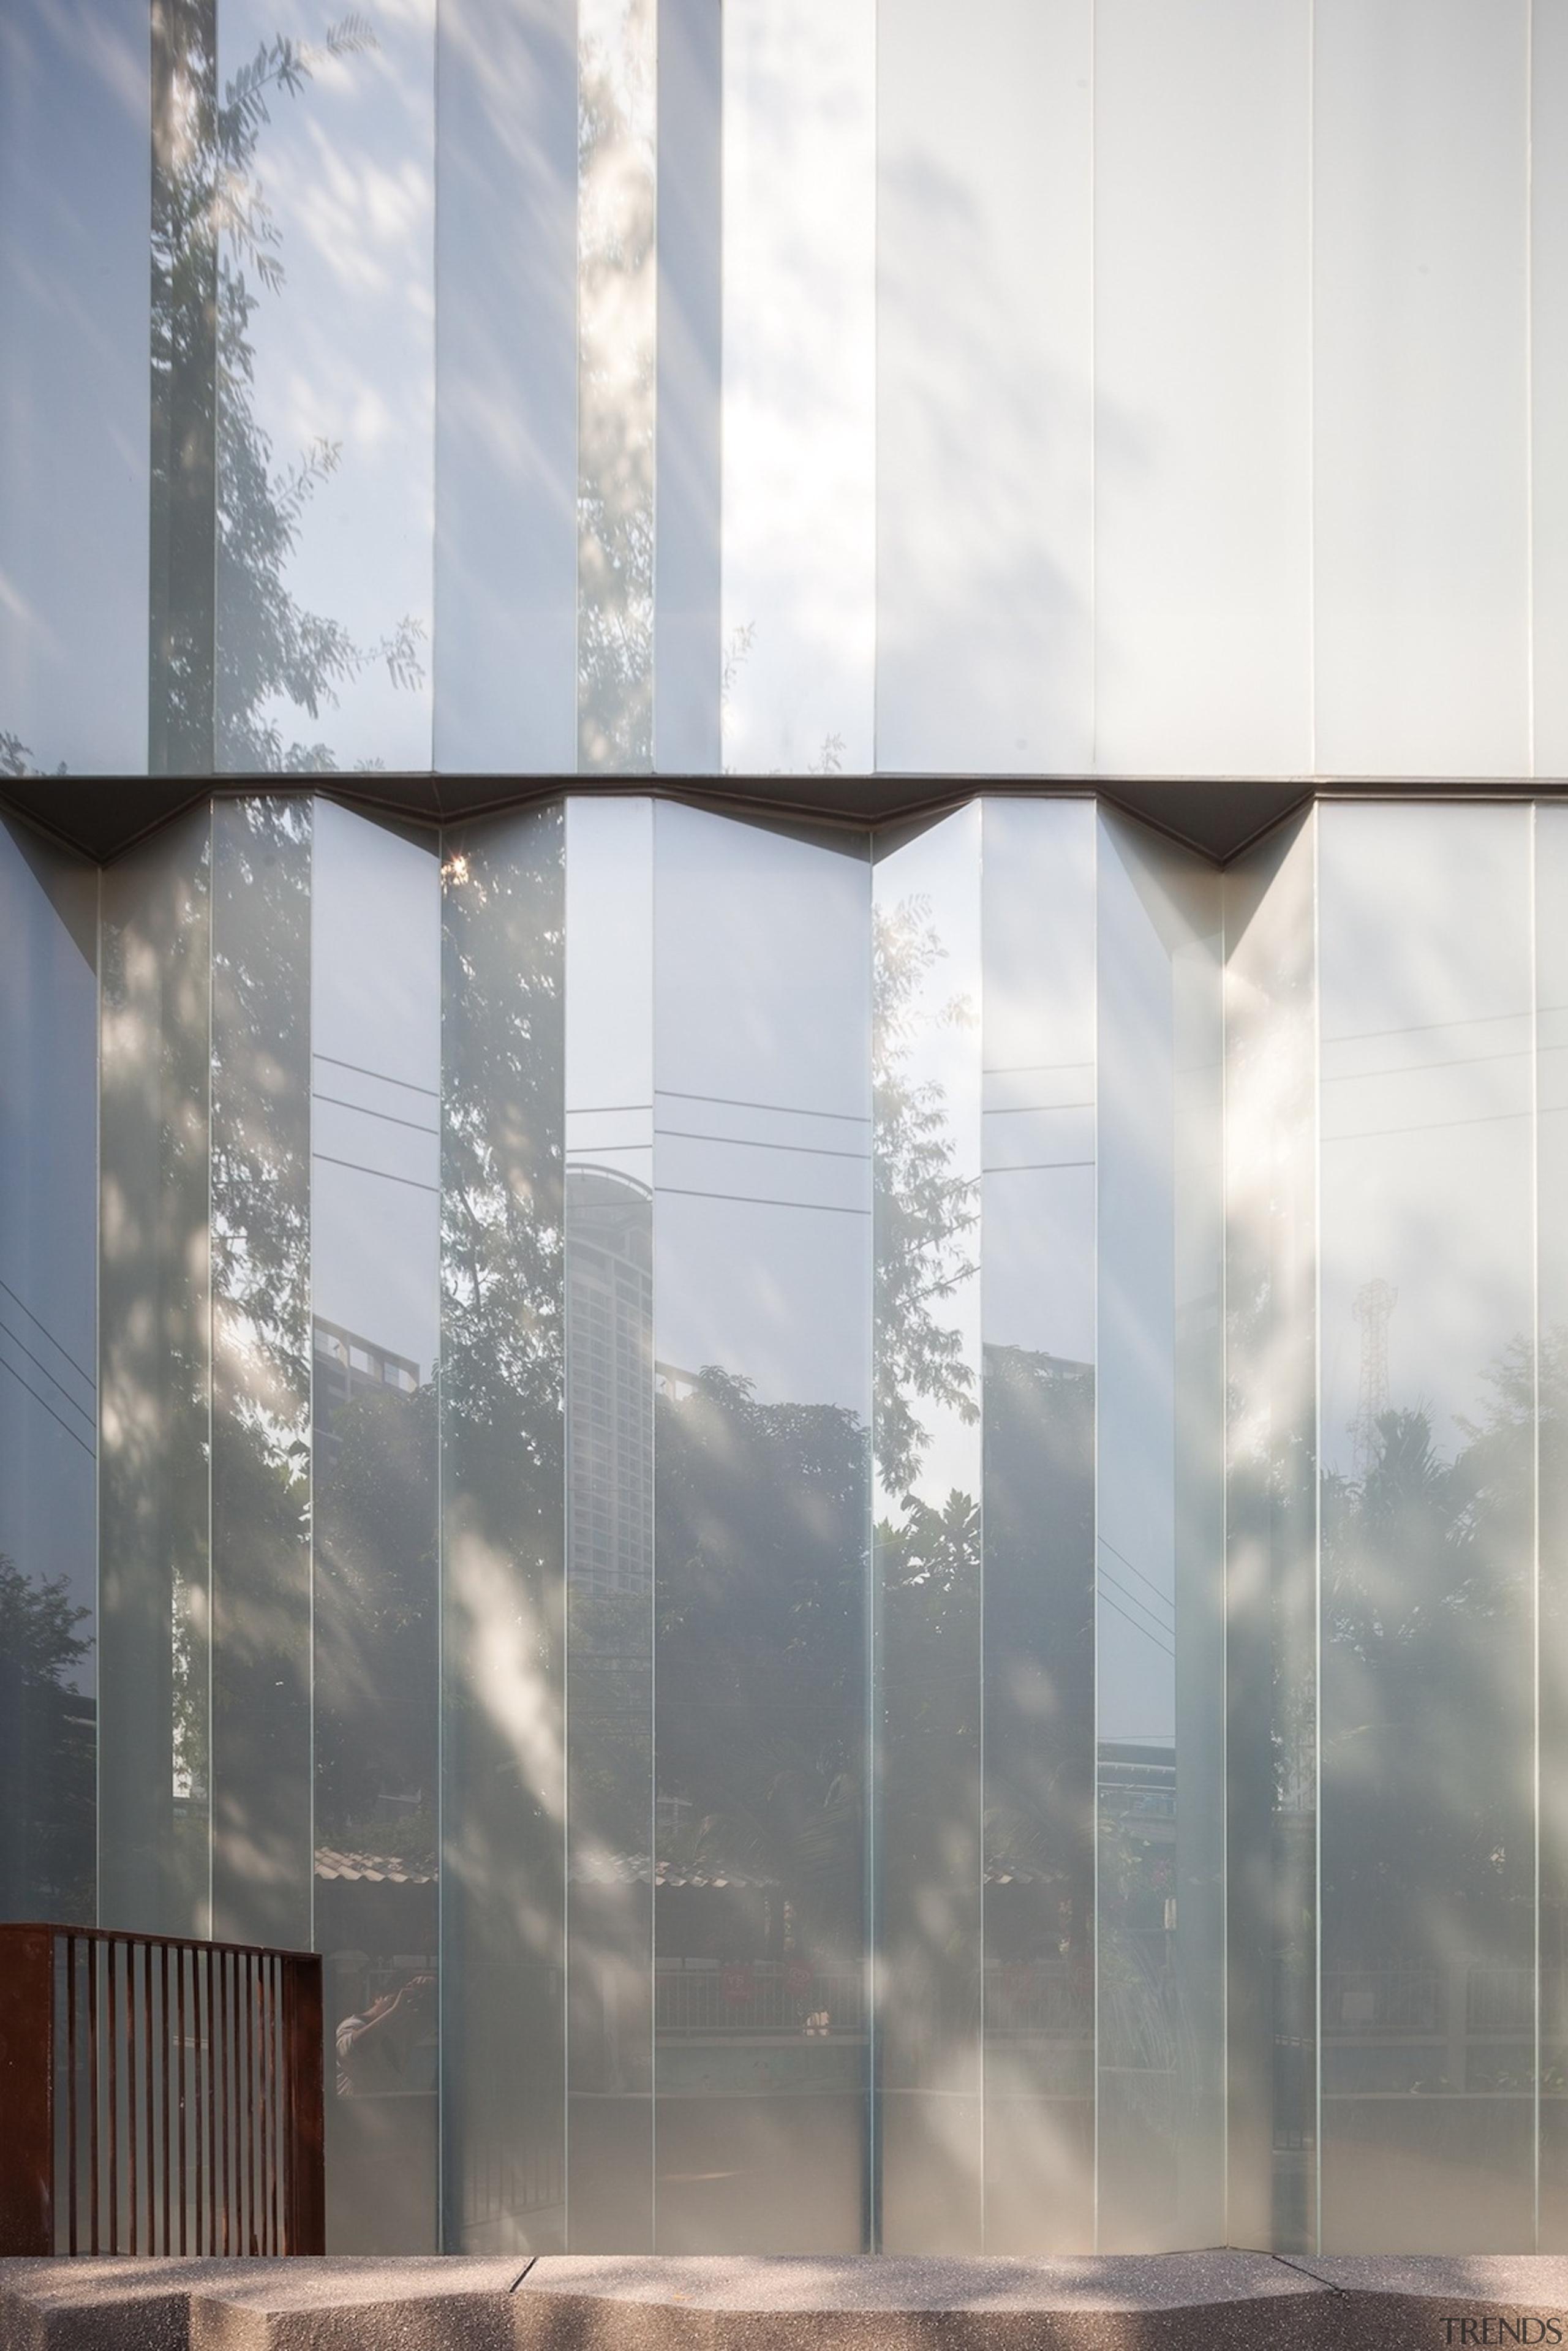 Naiipa 19 - architecture | building | daytime architecture, building, daytime, facade, glass, reflection, sky, sunlight, window, gray, white